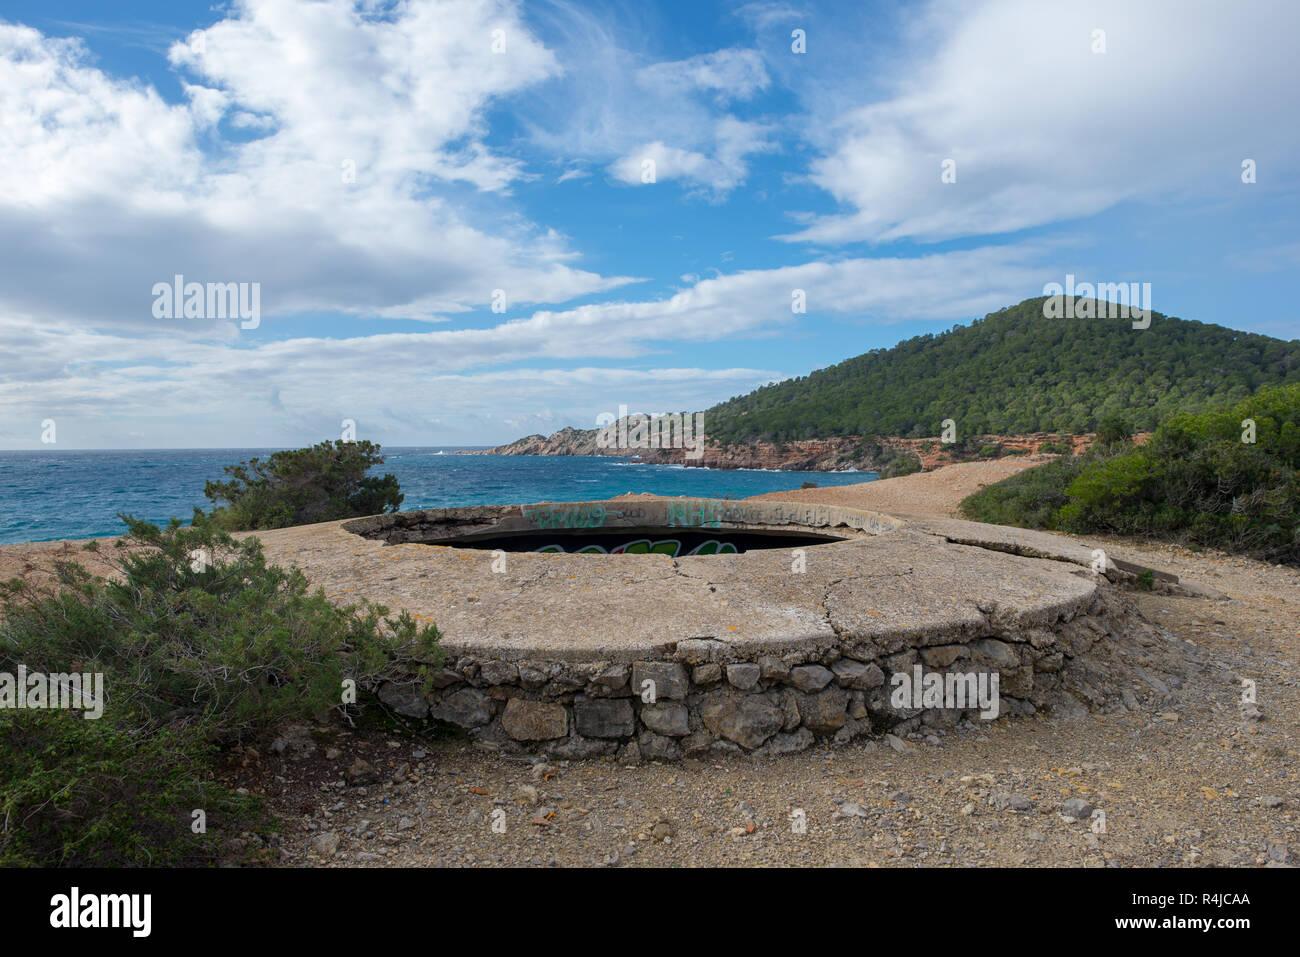 Phoenician settlement in cala sa caleta, Ibiza, Spain - Stock Image